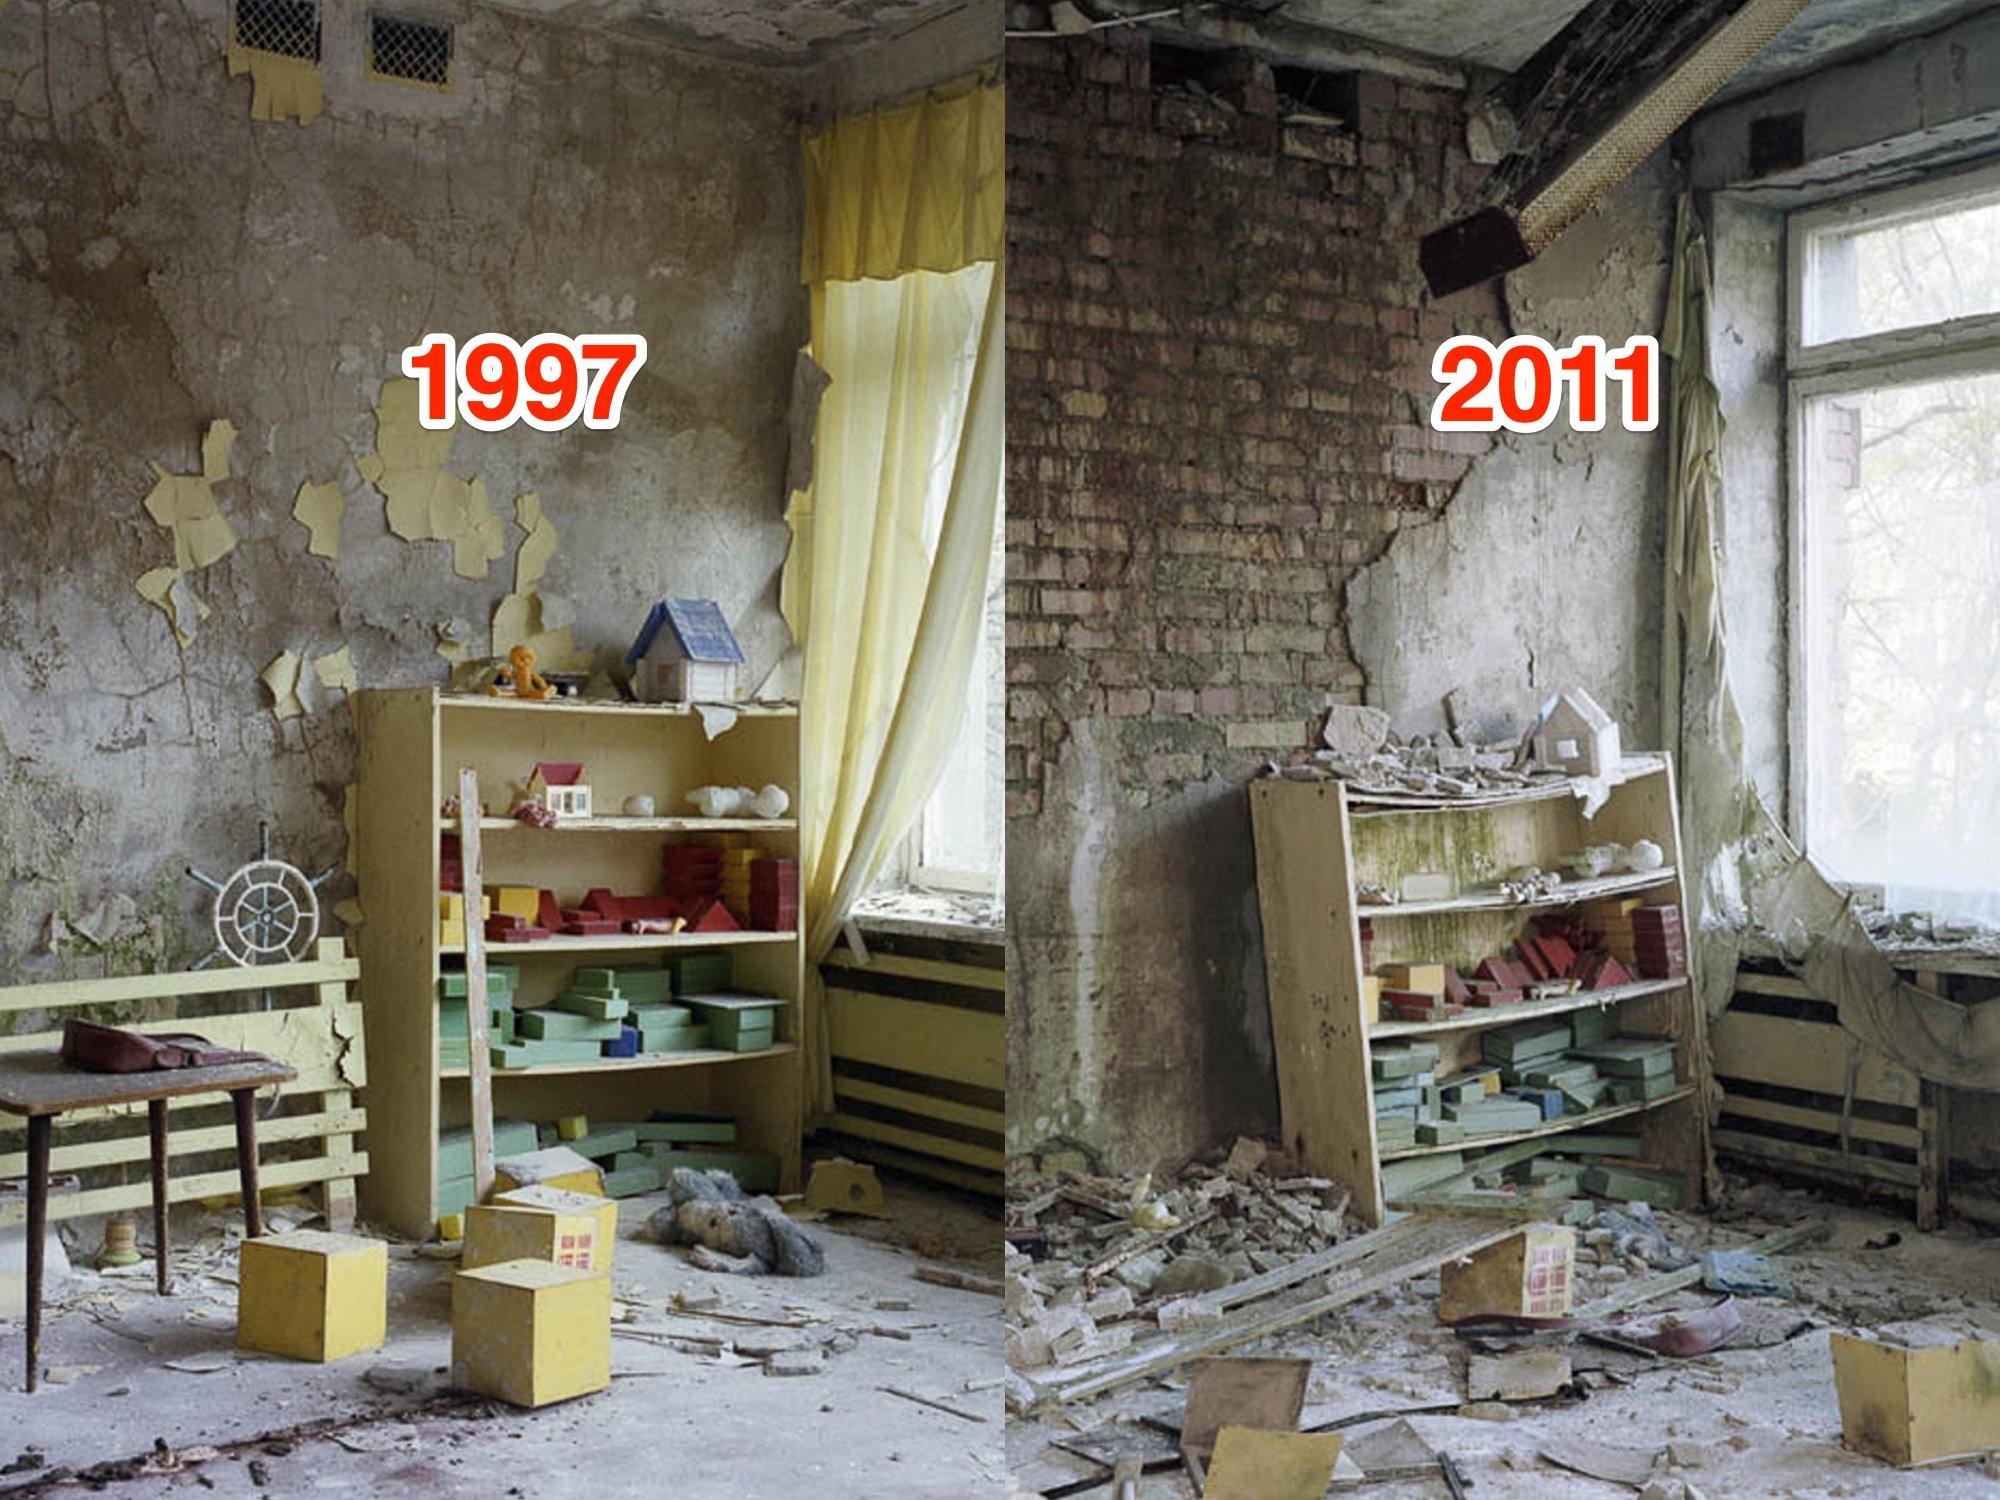 chernobyl amazon prime